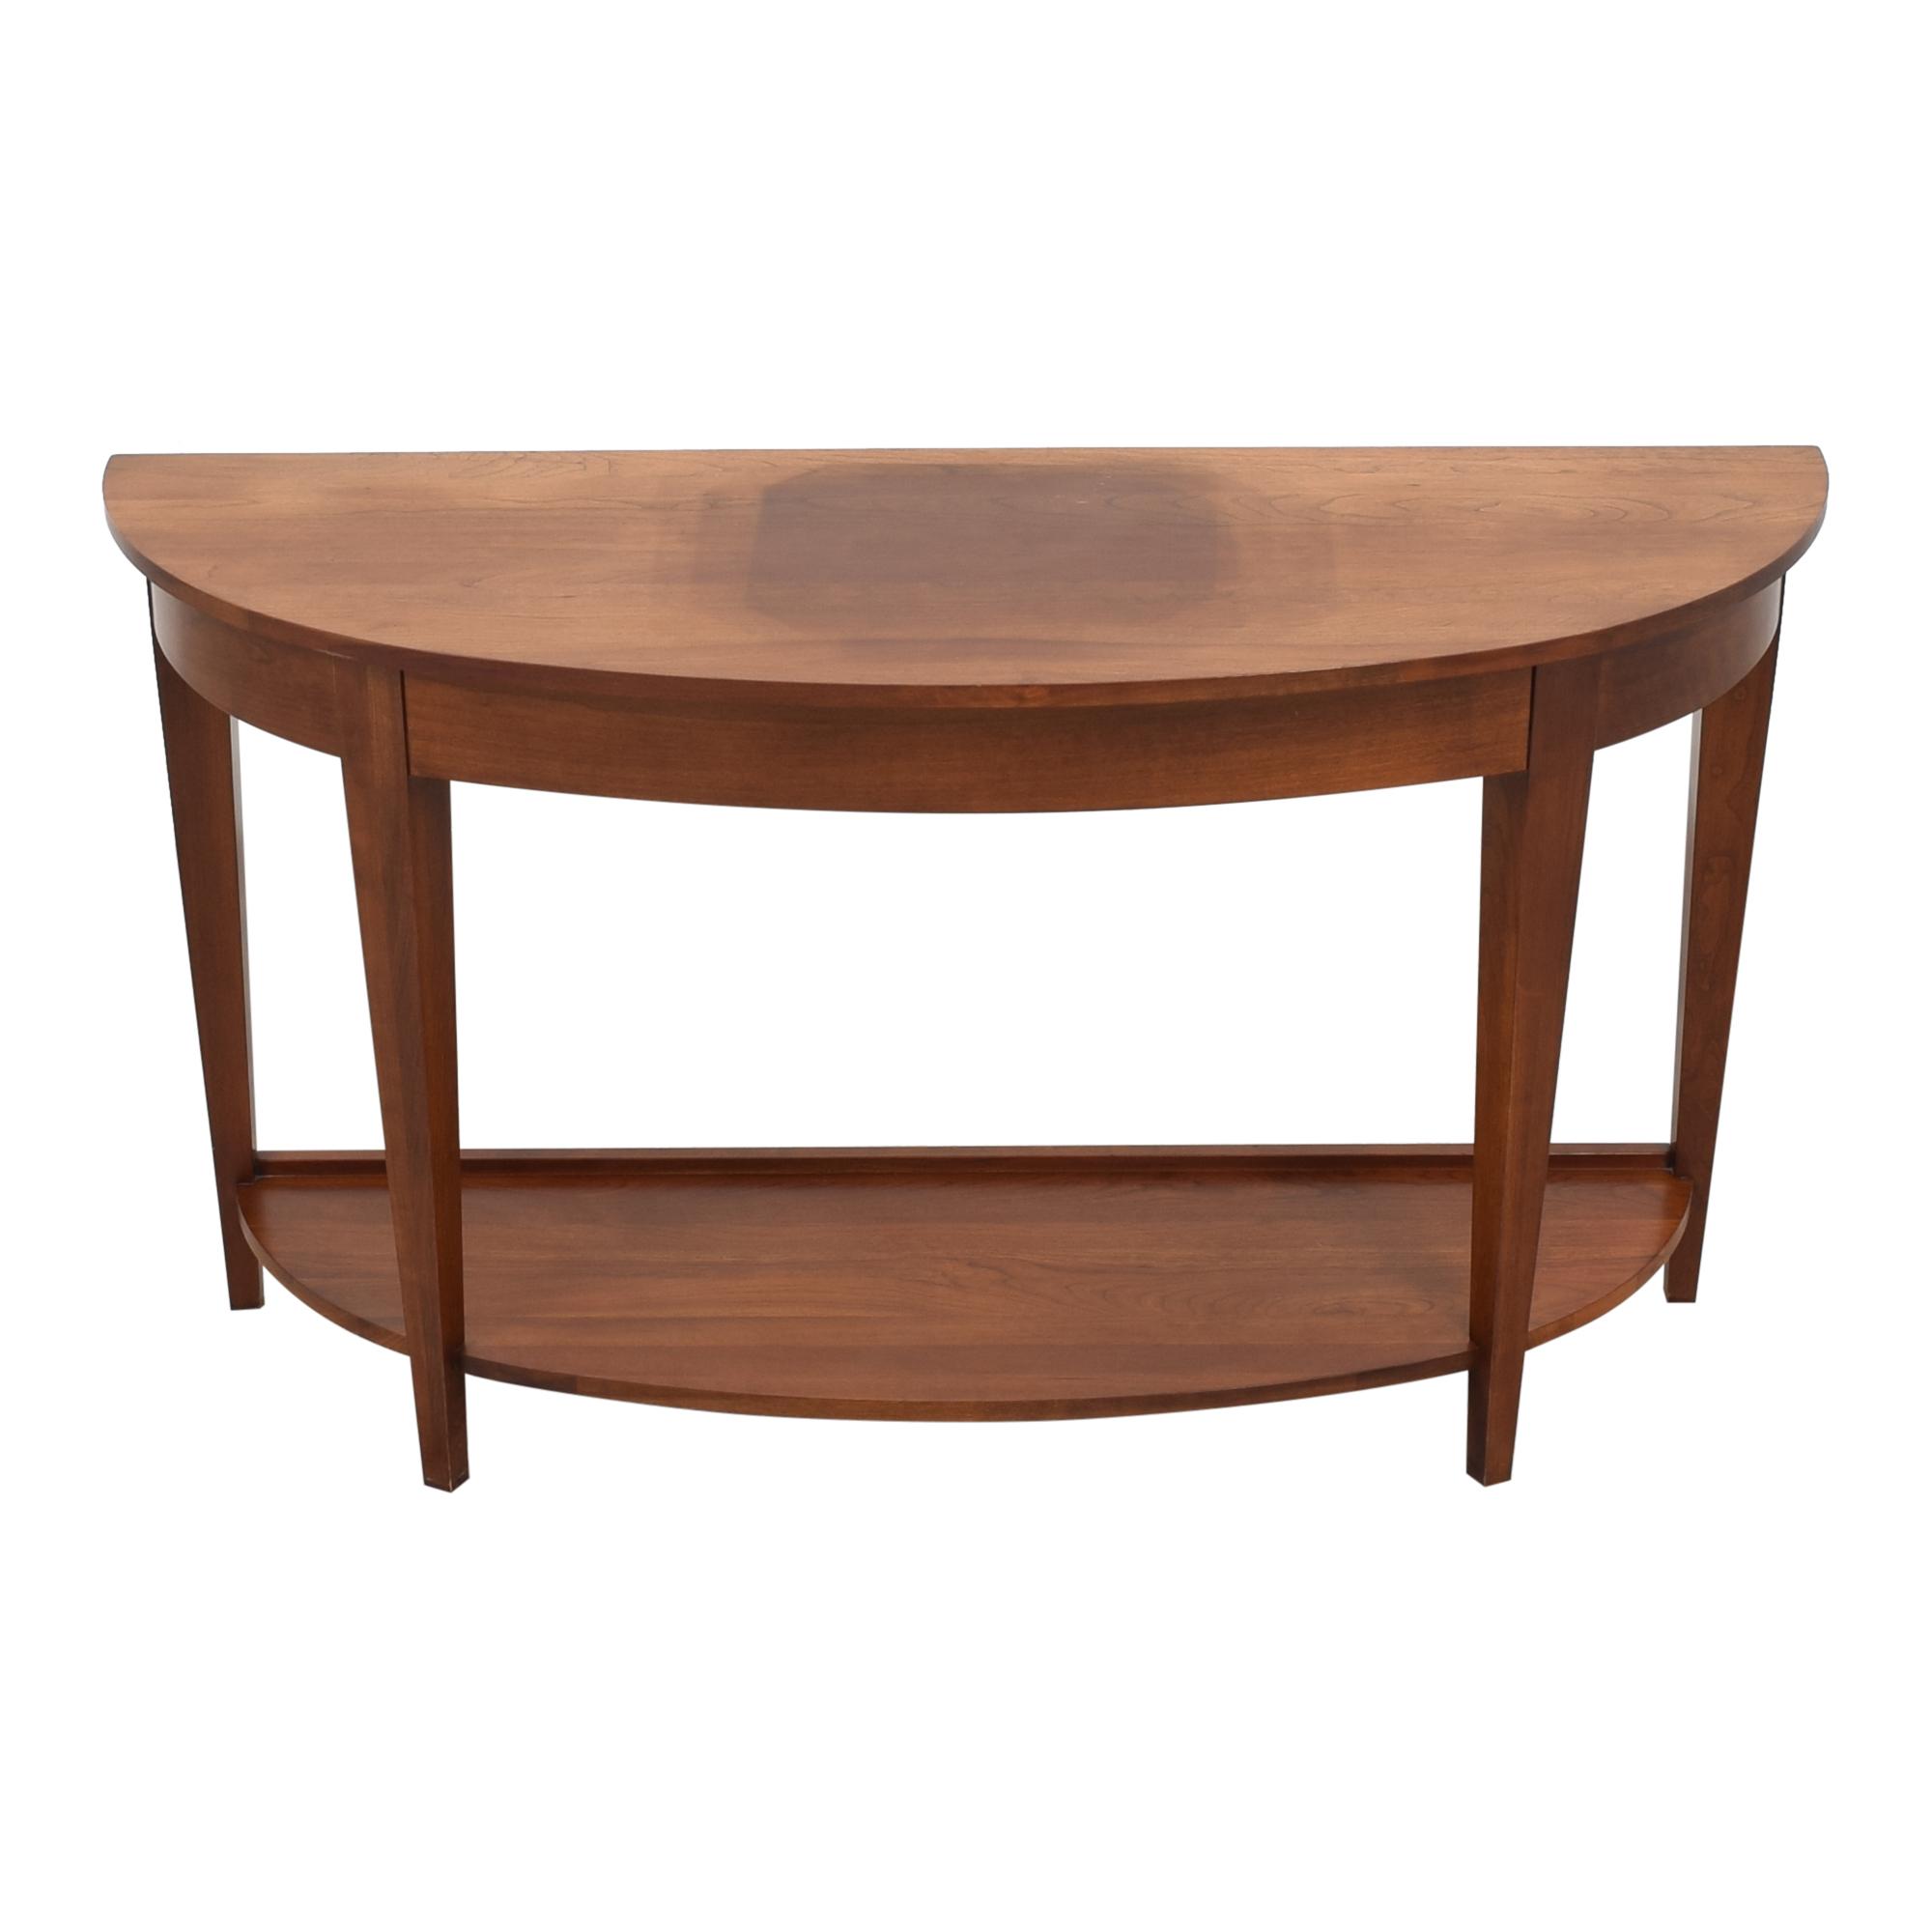 buy Ethan Allen Ethan Allen American Impressions Demilune Sofa Table online